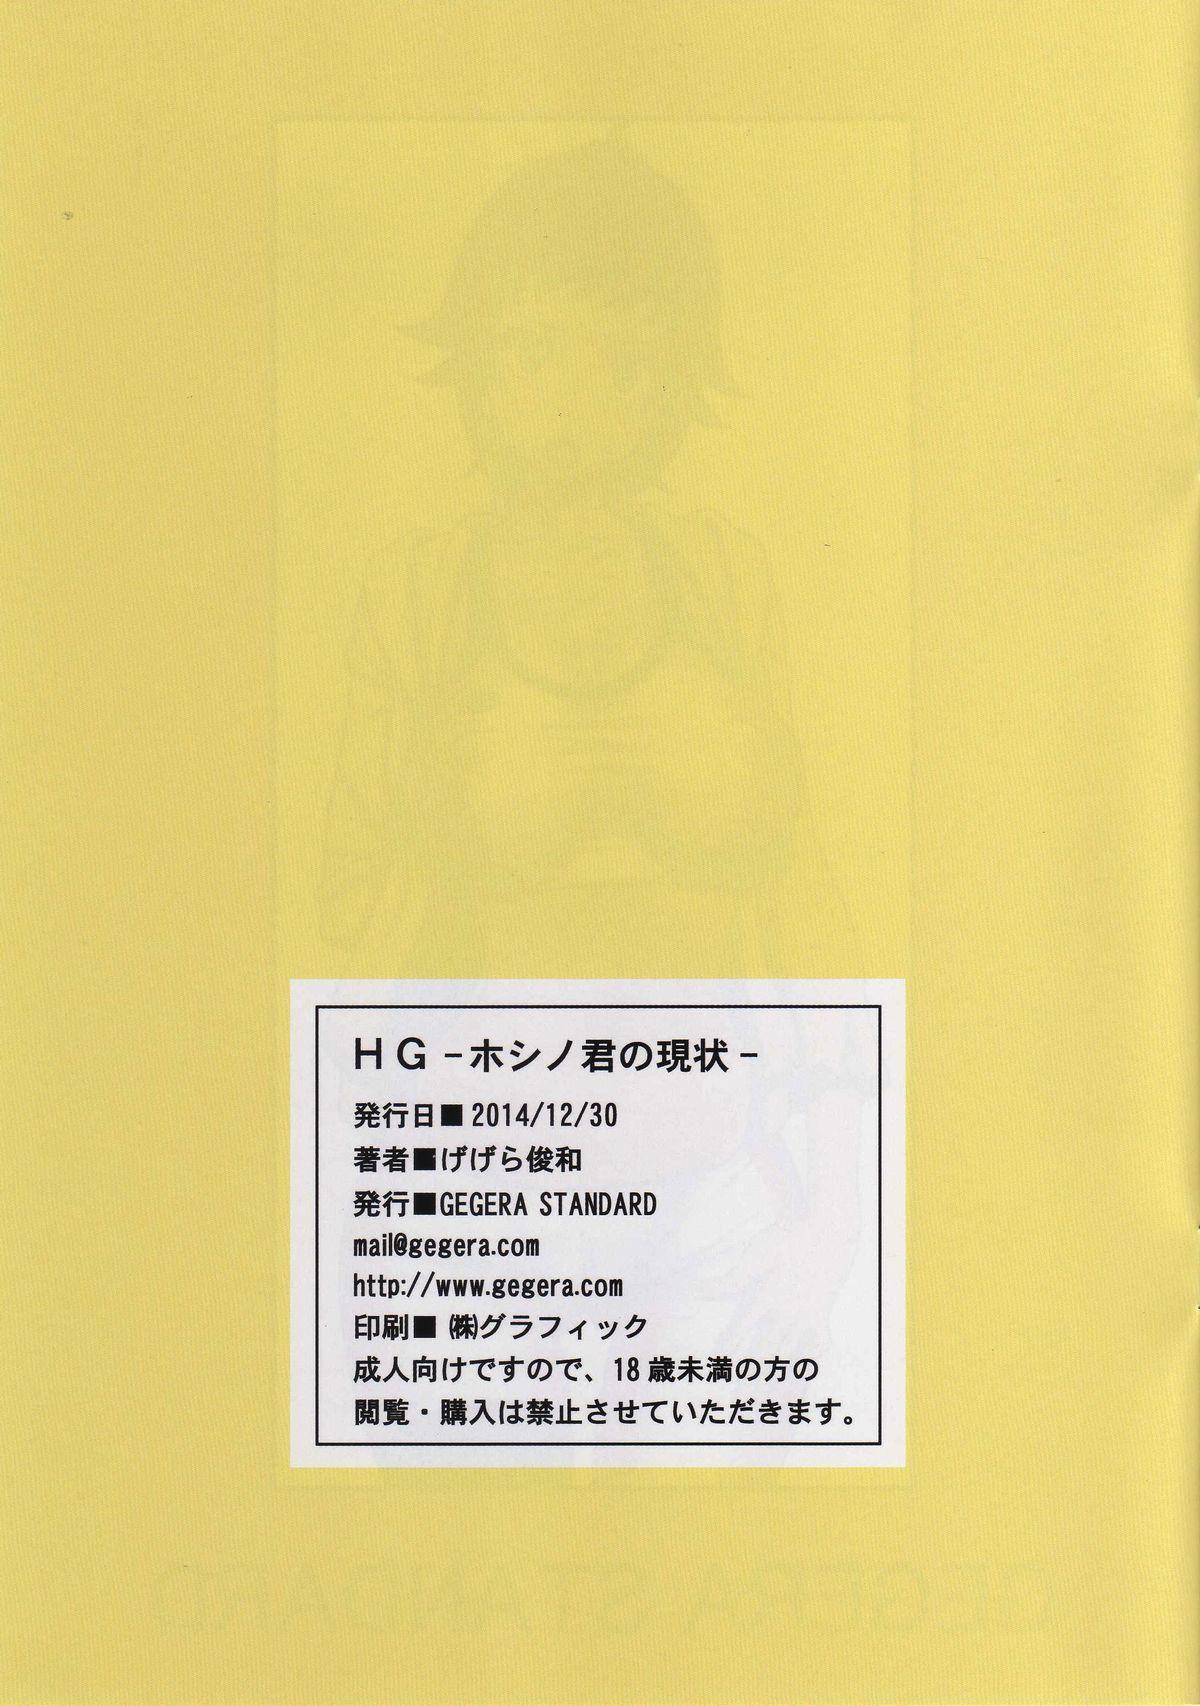 (C87) [GEGERA STANDARD (Gegera Toshikazu)] HG -Hoshino-kun no Genjou- (Gundam Build Fighters Try) 14